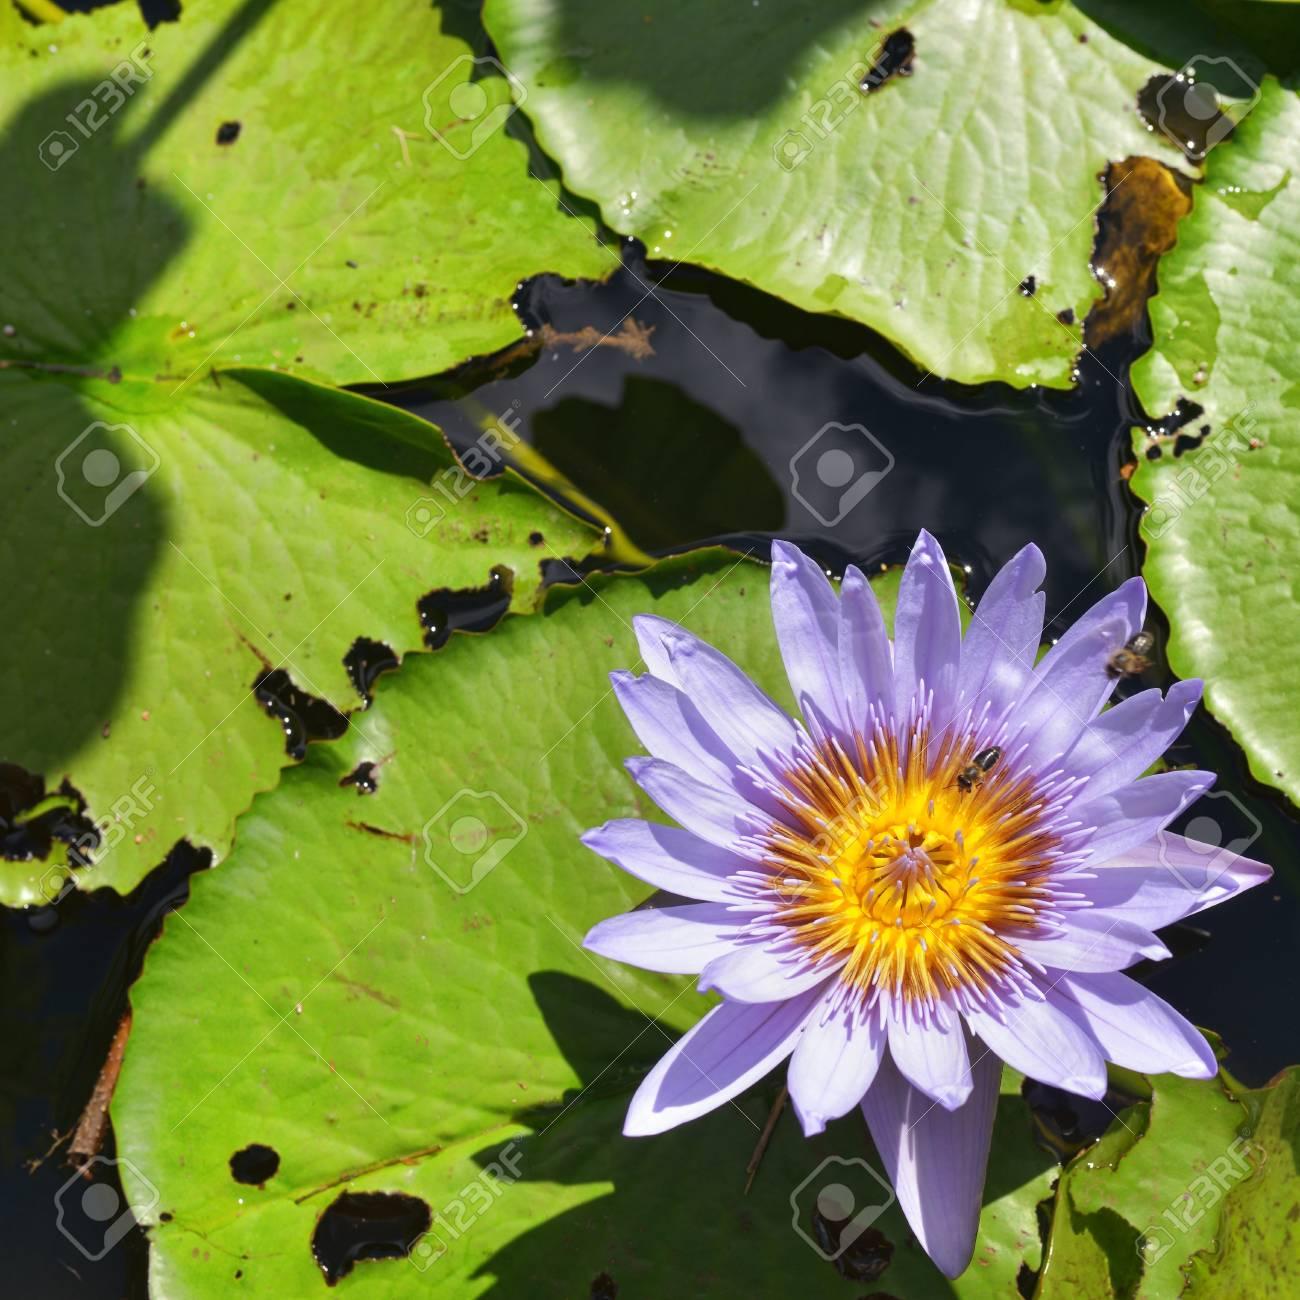 Lotus flower closeup mauritius island africa pamplemousses stock lotus flower closeup mauritius island africa pamplemousses garden stock photo 20408523 mightylinksfo